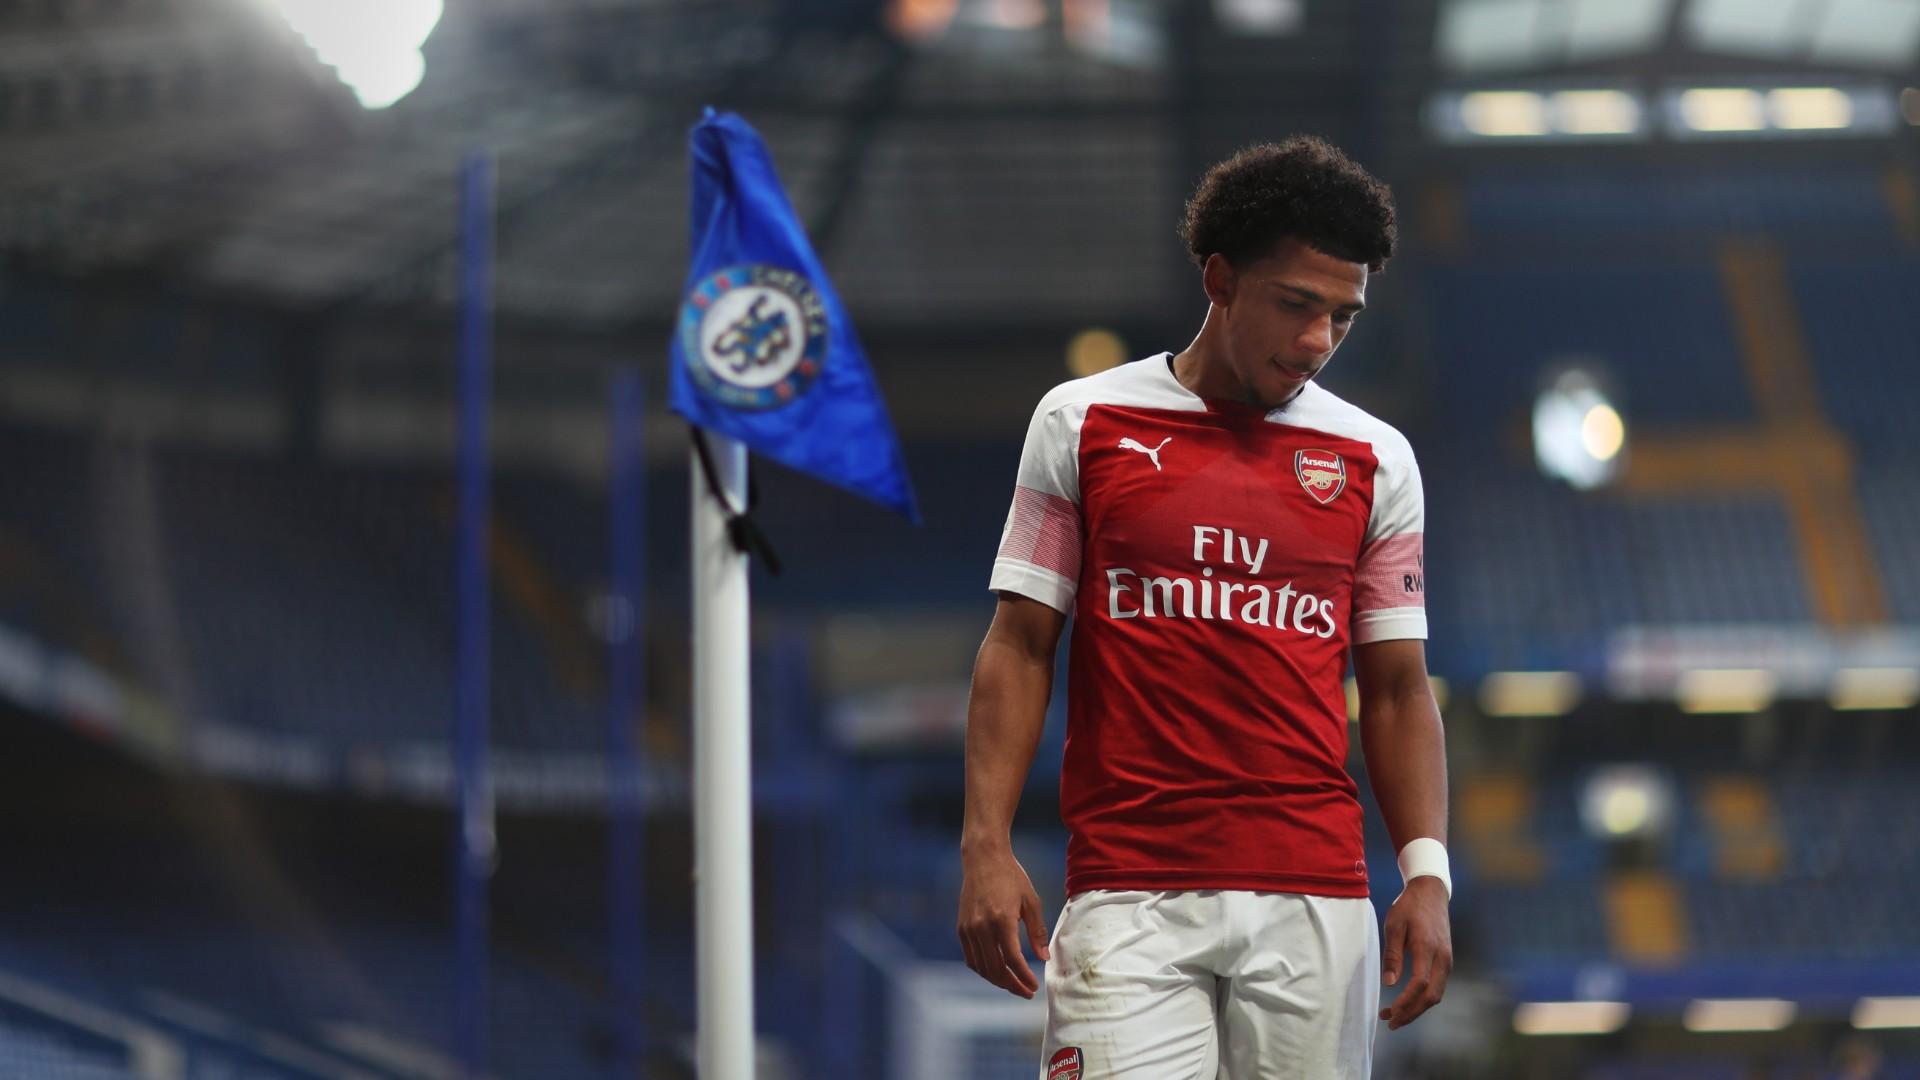 Xavier Amaechi Arsenal 2018/19